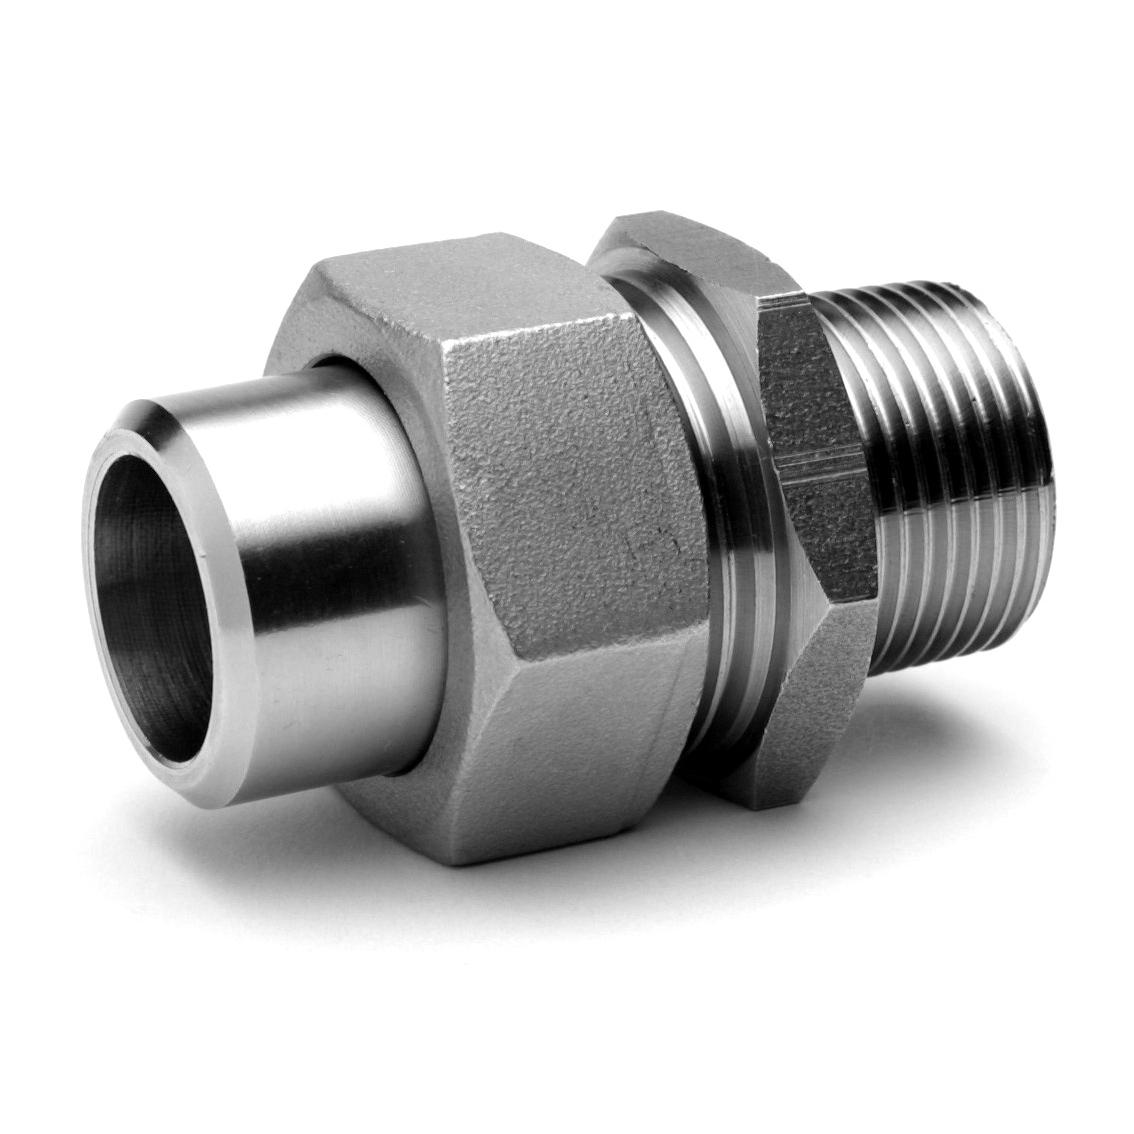 Raccord union 3 pièces LM inox 316 Raccorderie Metalliche